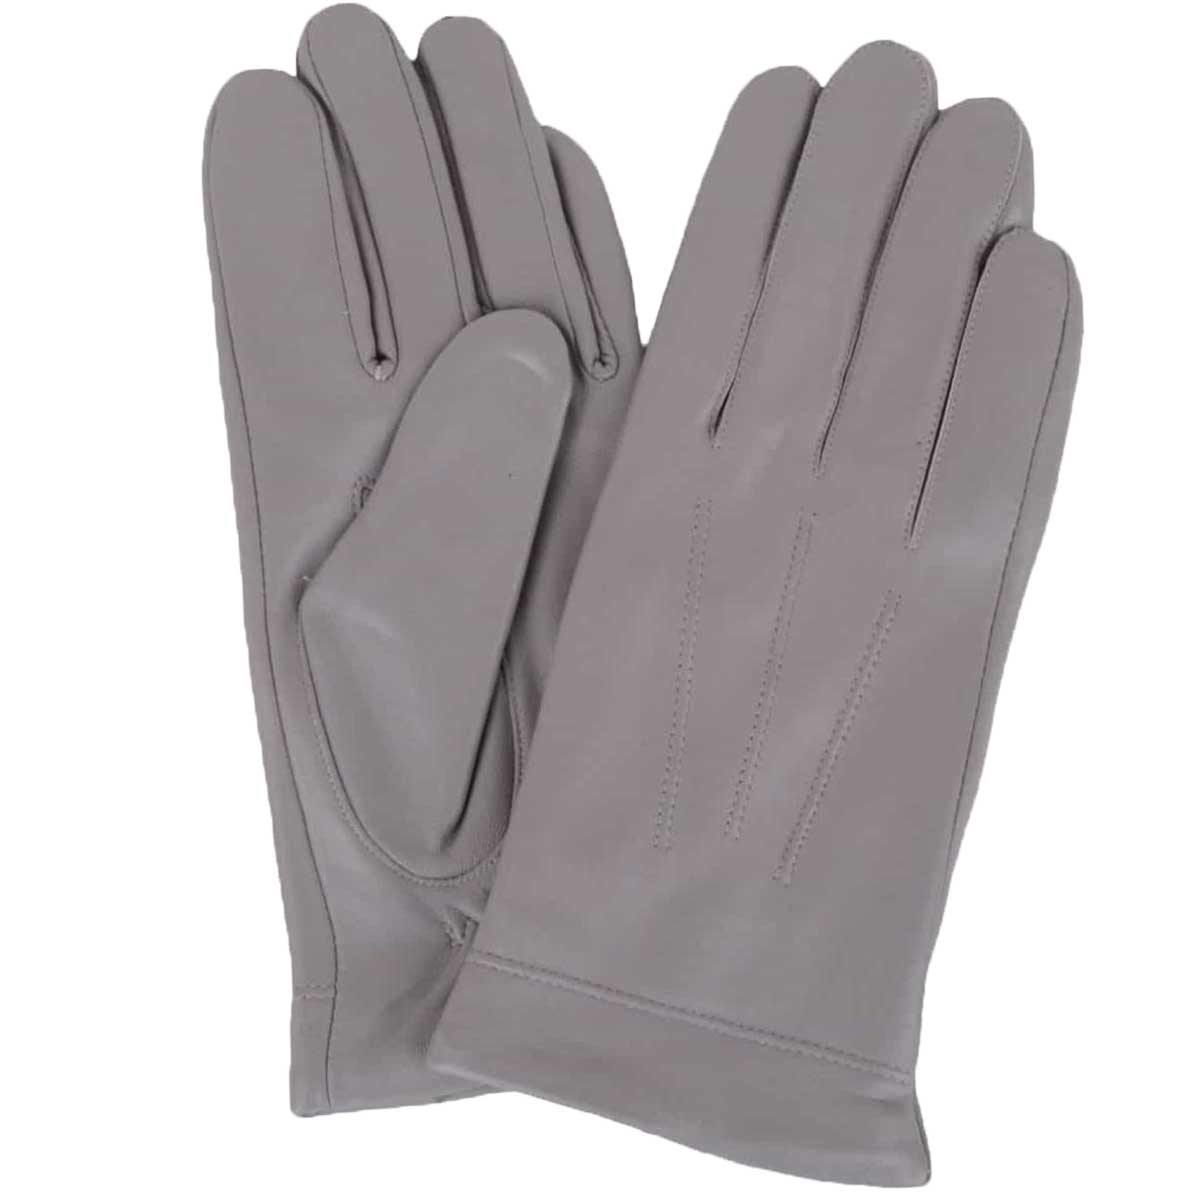 Snugrugs - Ladies Leather Fleece Lined Gloves – Grey